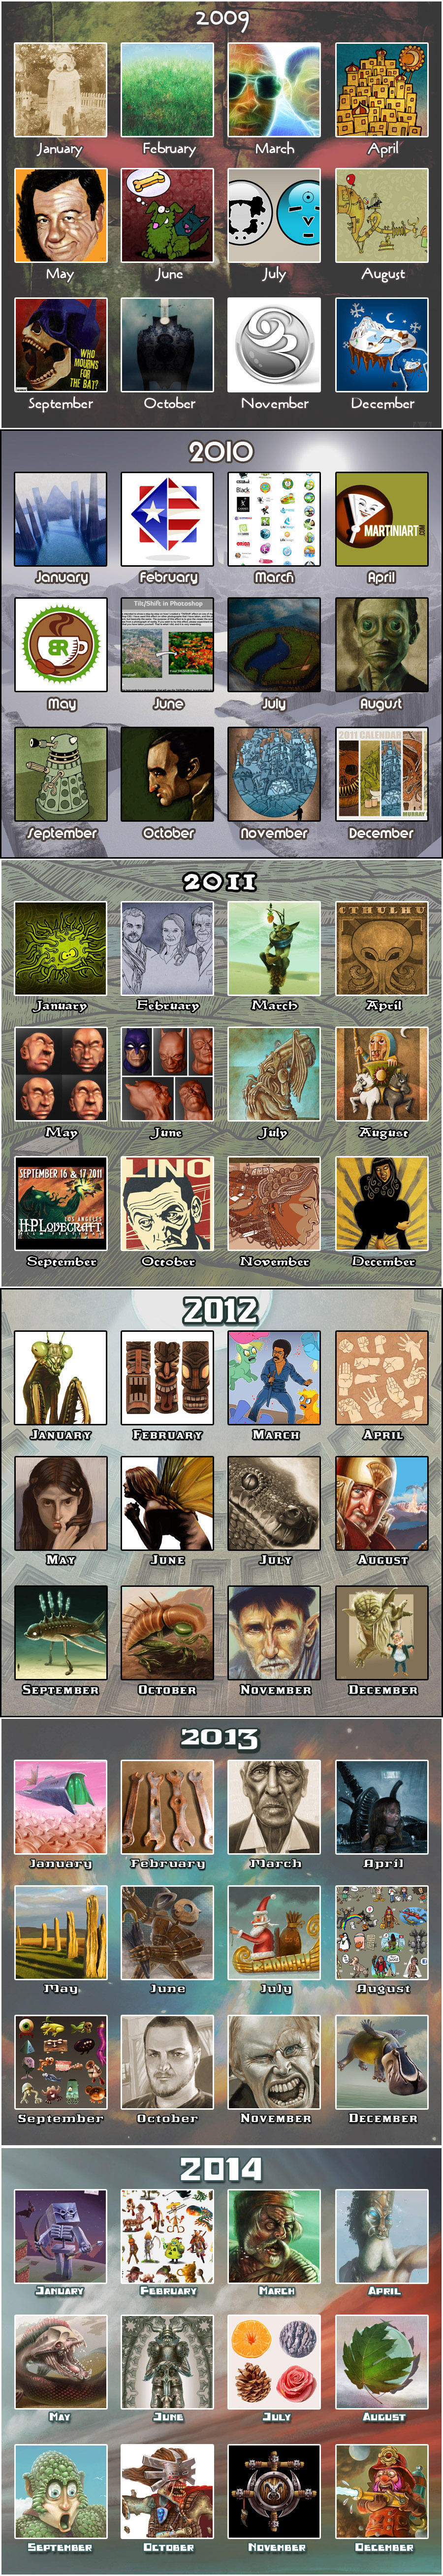 Muzski MEME 2009 - 2014 by muzski